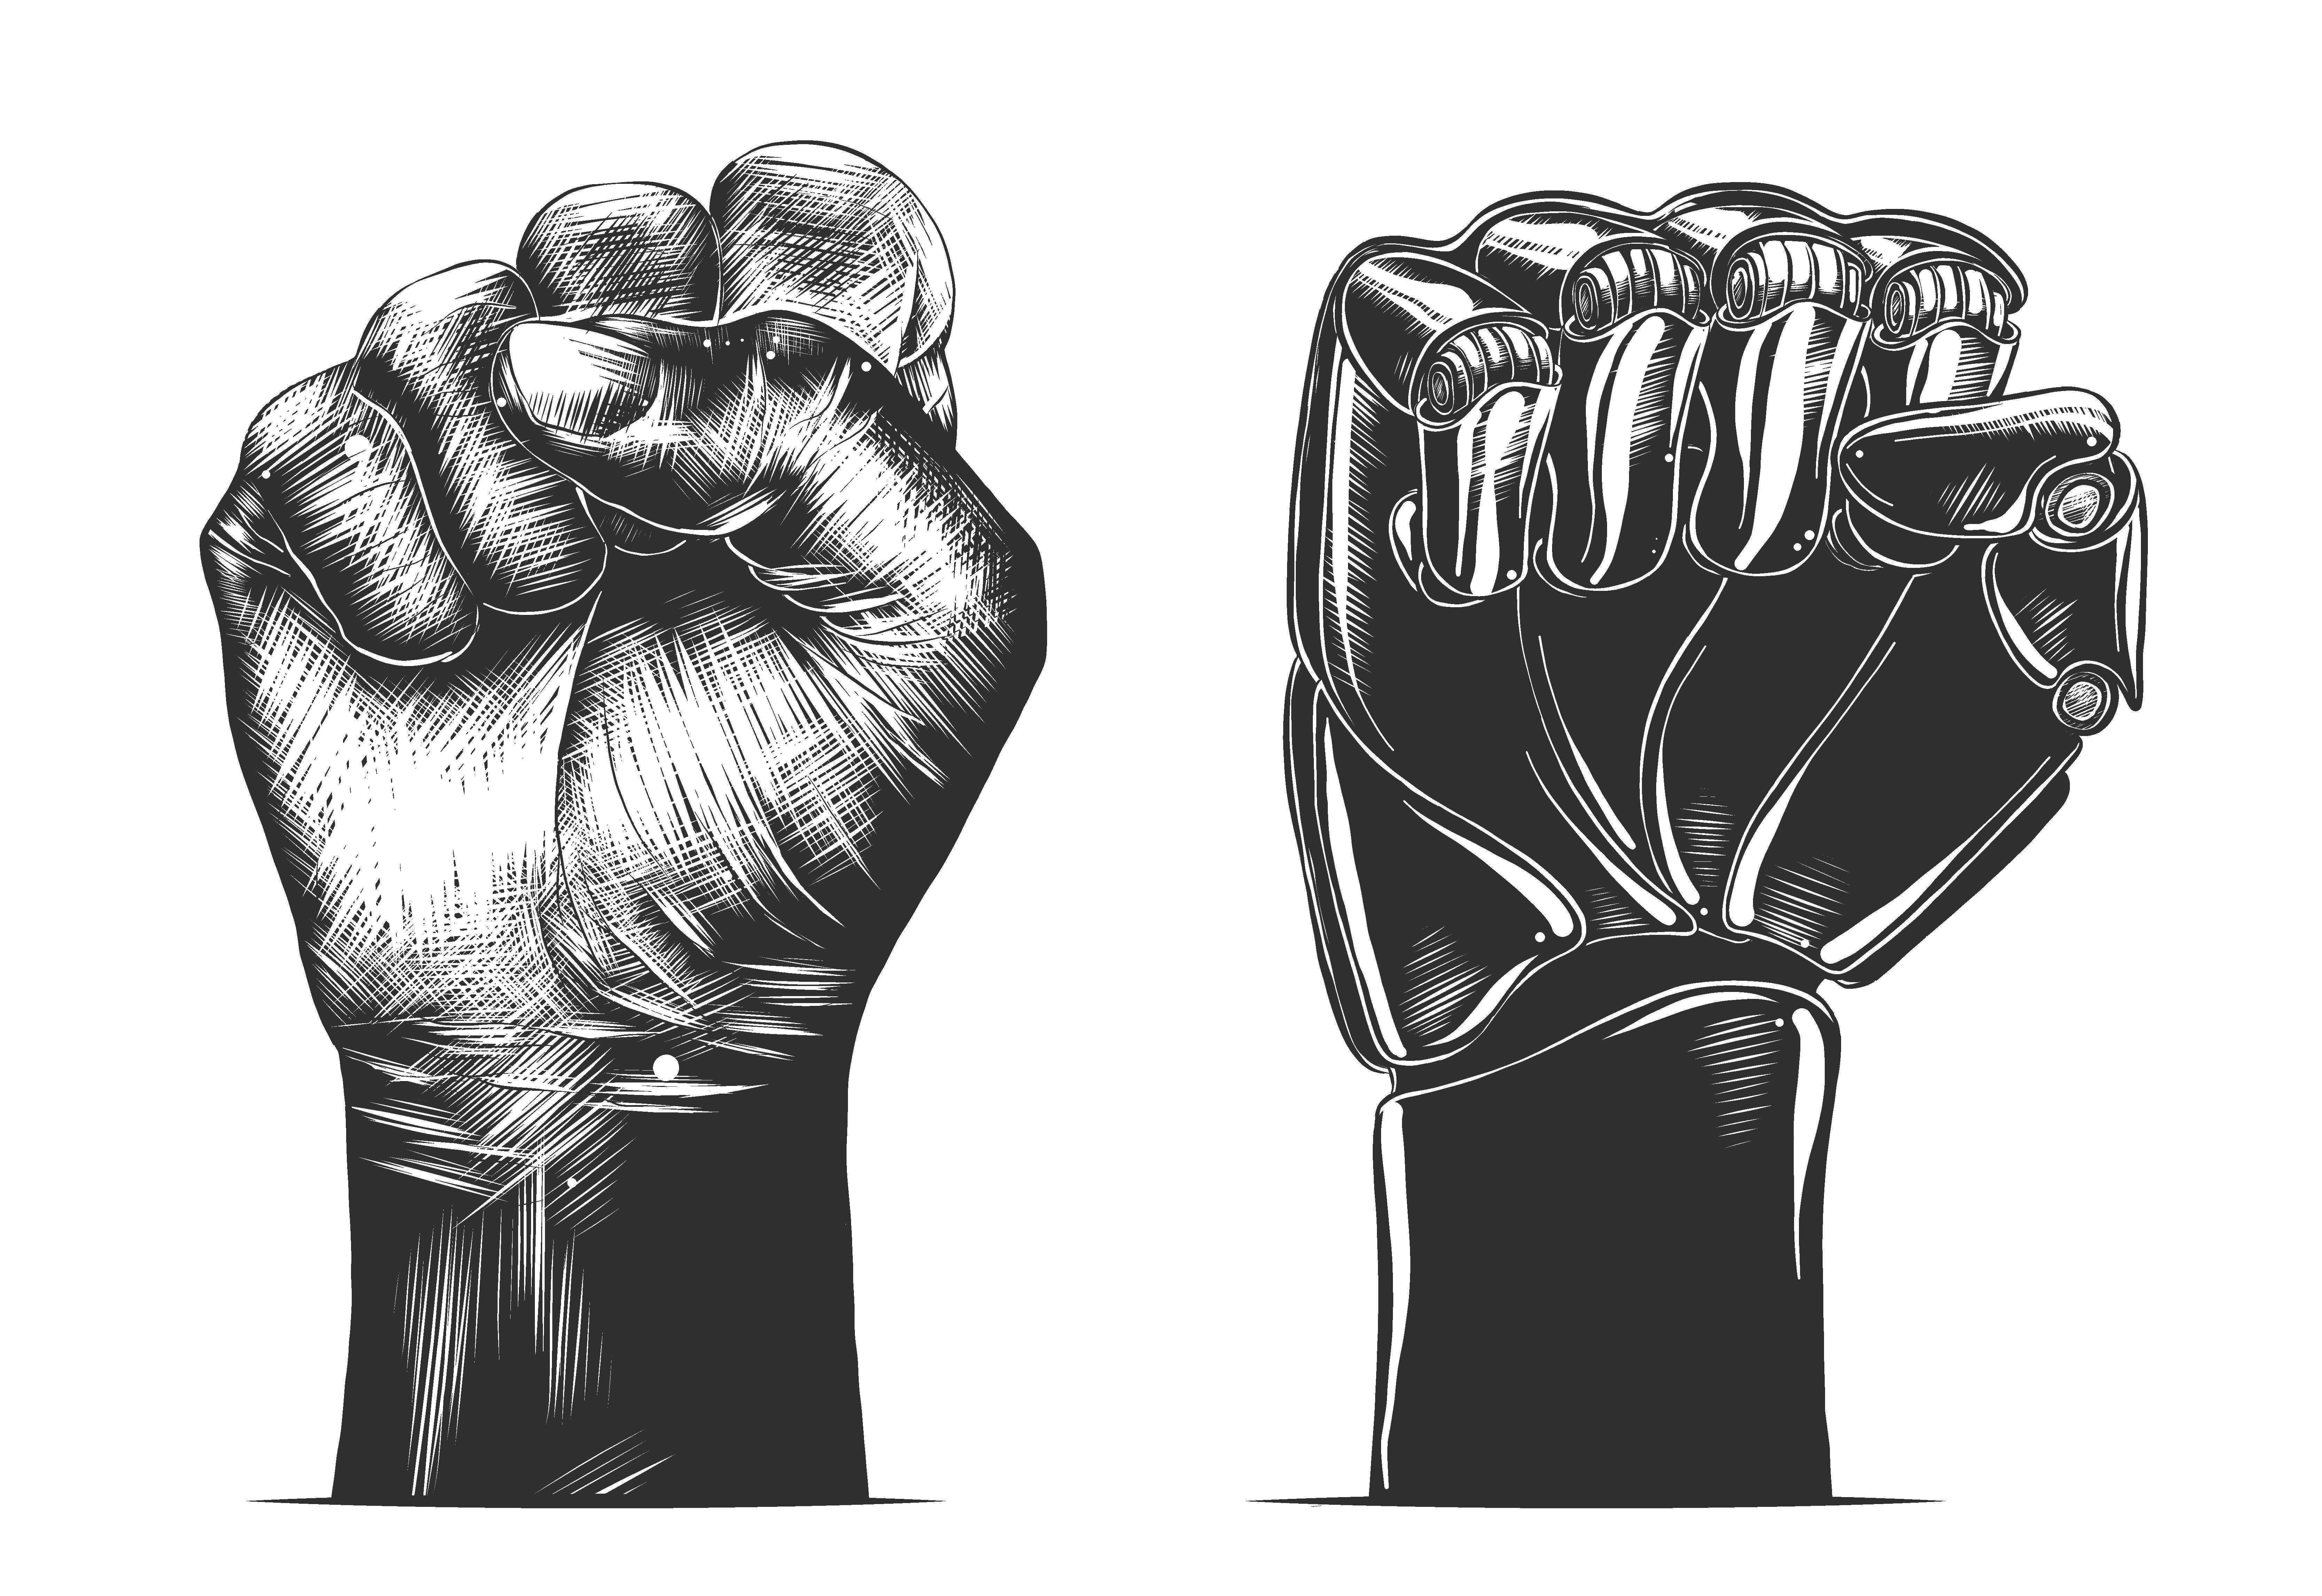 La revolución tecnológica necesita ética o nos esclavizará